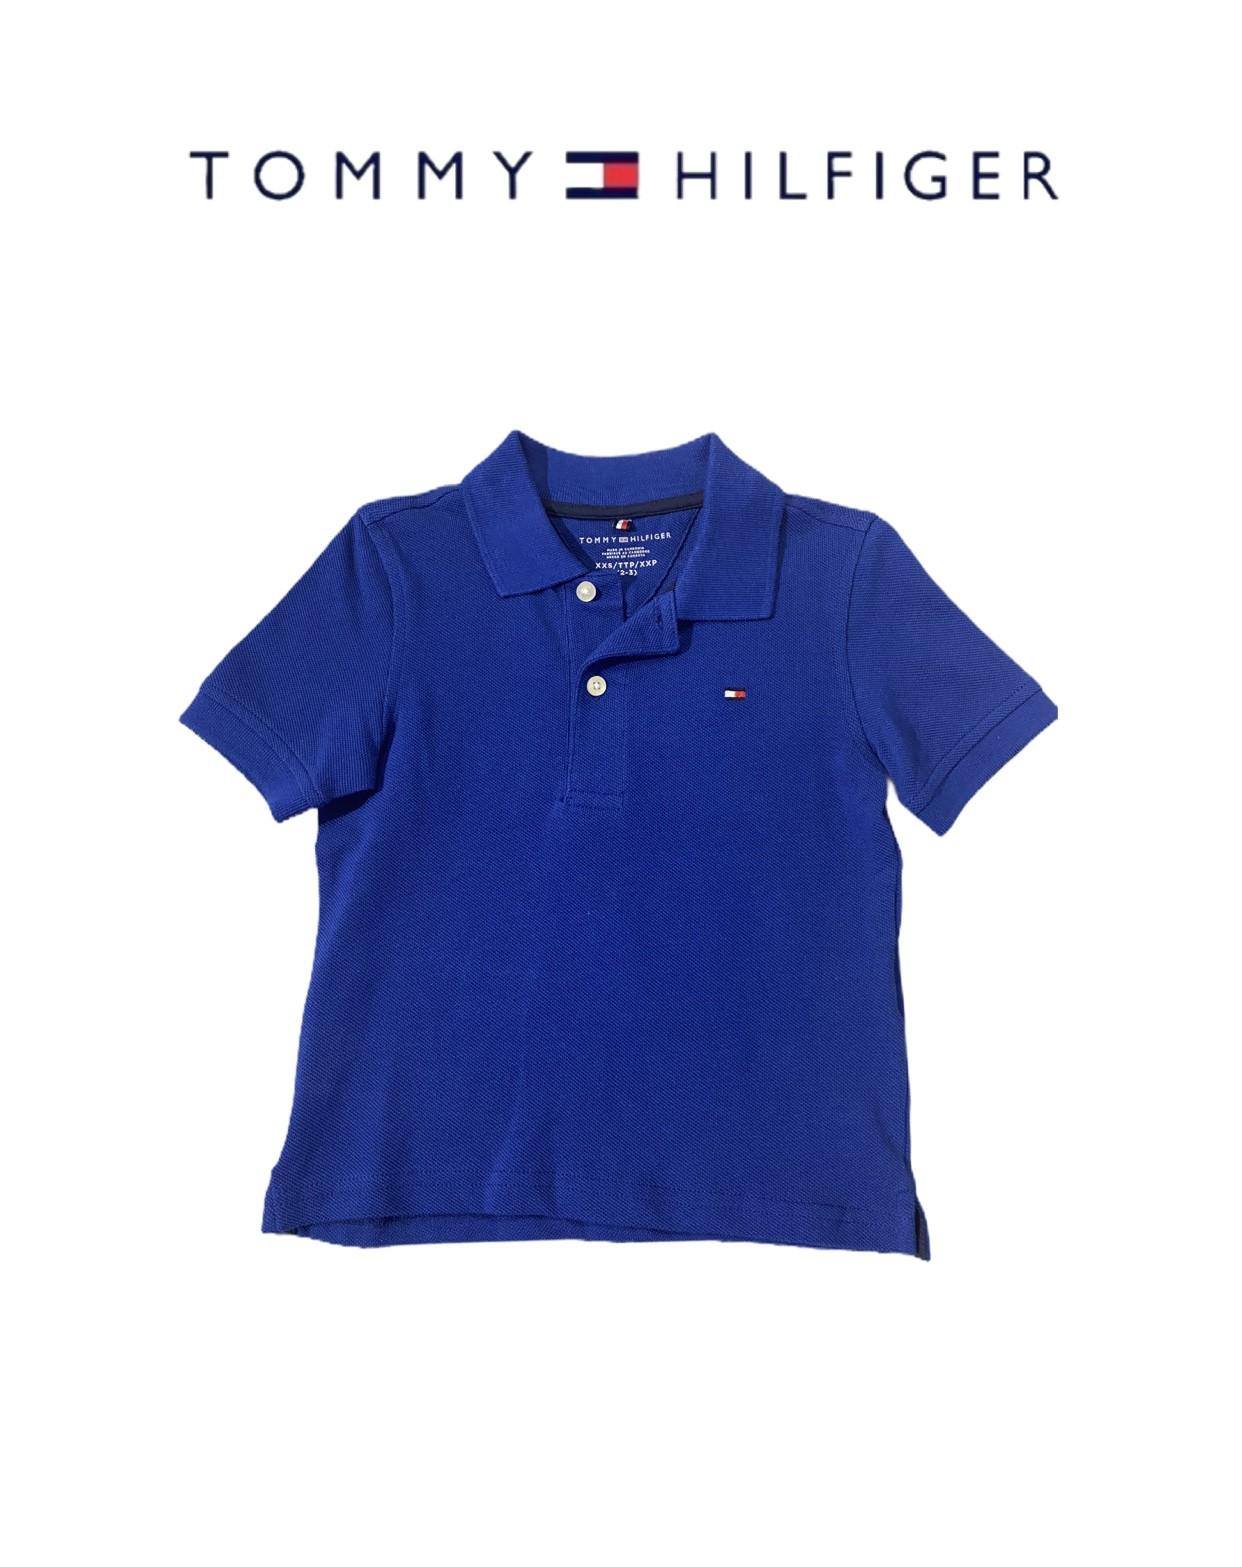 POLO TOMMY HILFIGER® AZUL ROYAL